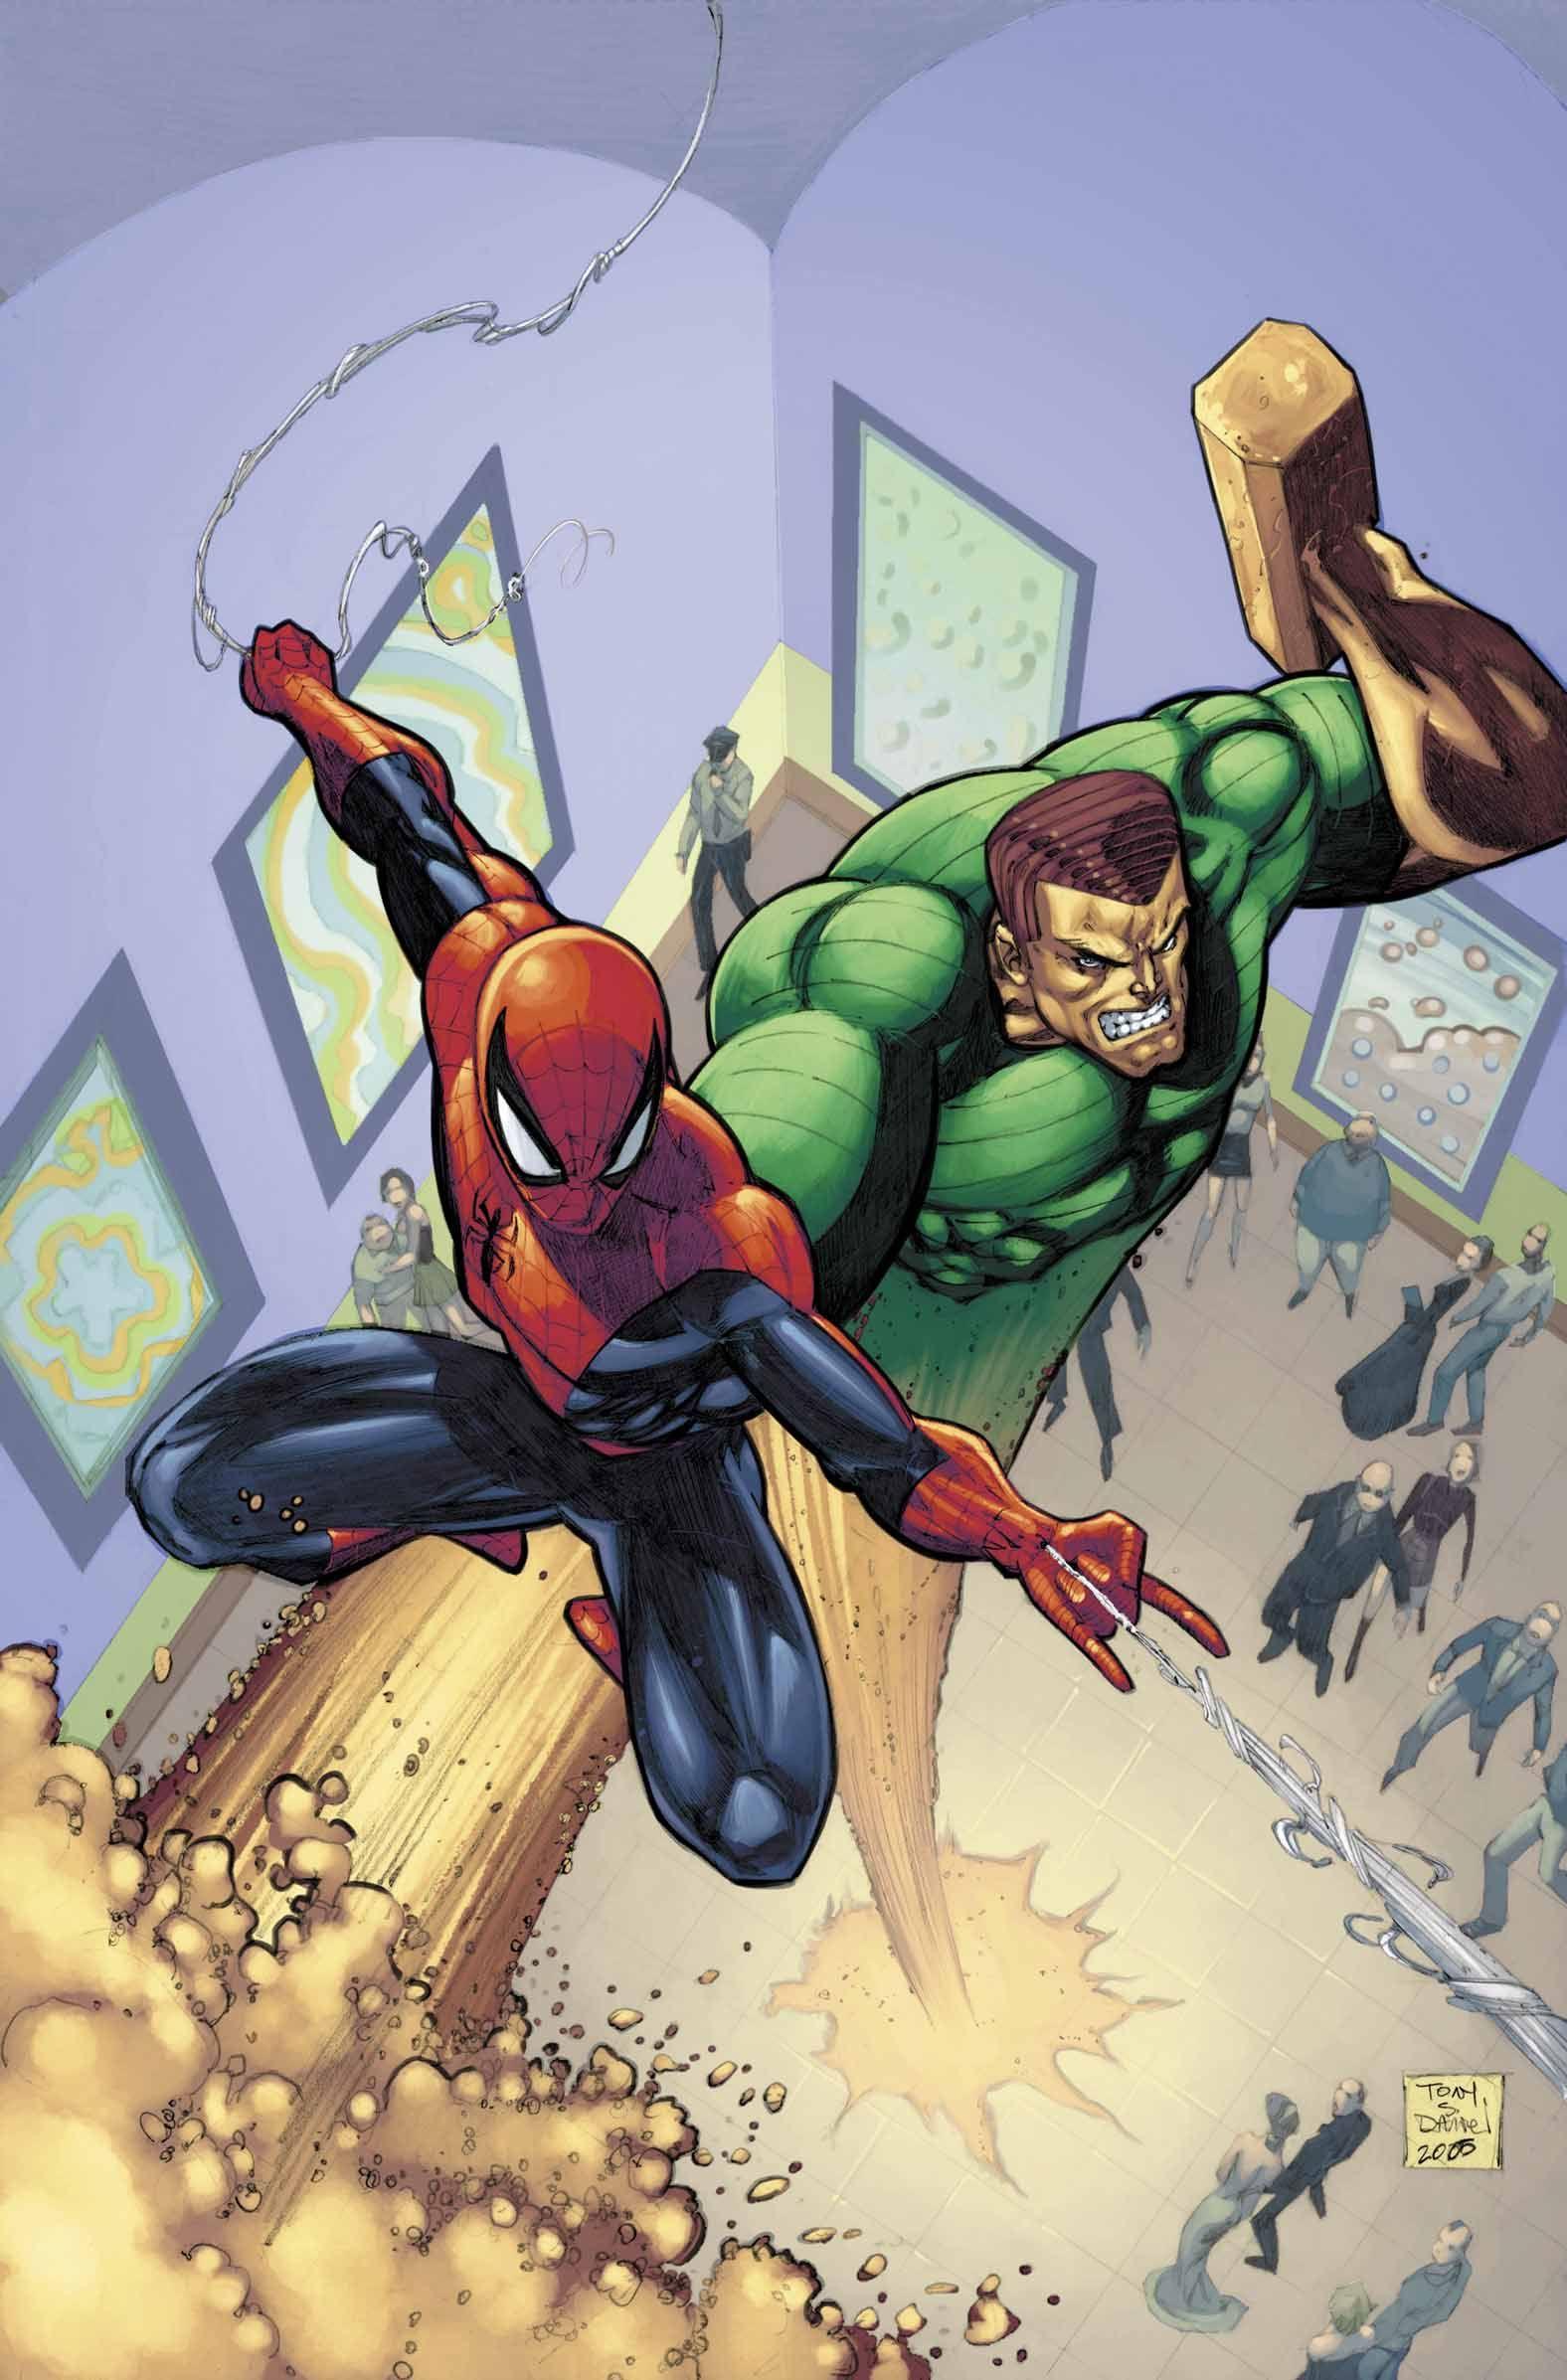 Spiderman vs sandman | Marvel villains, Amazing spiderman ...